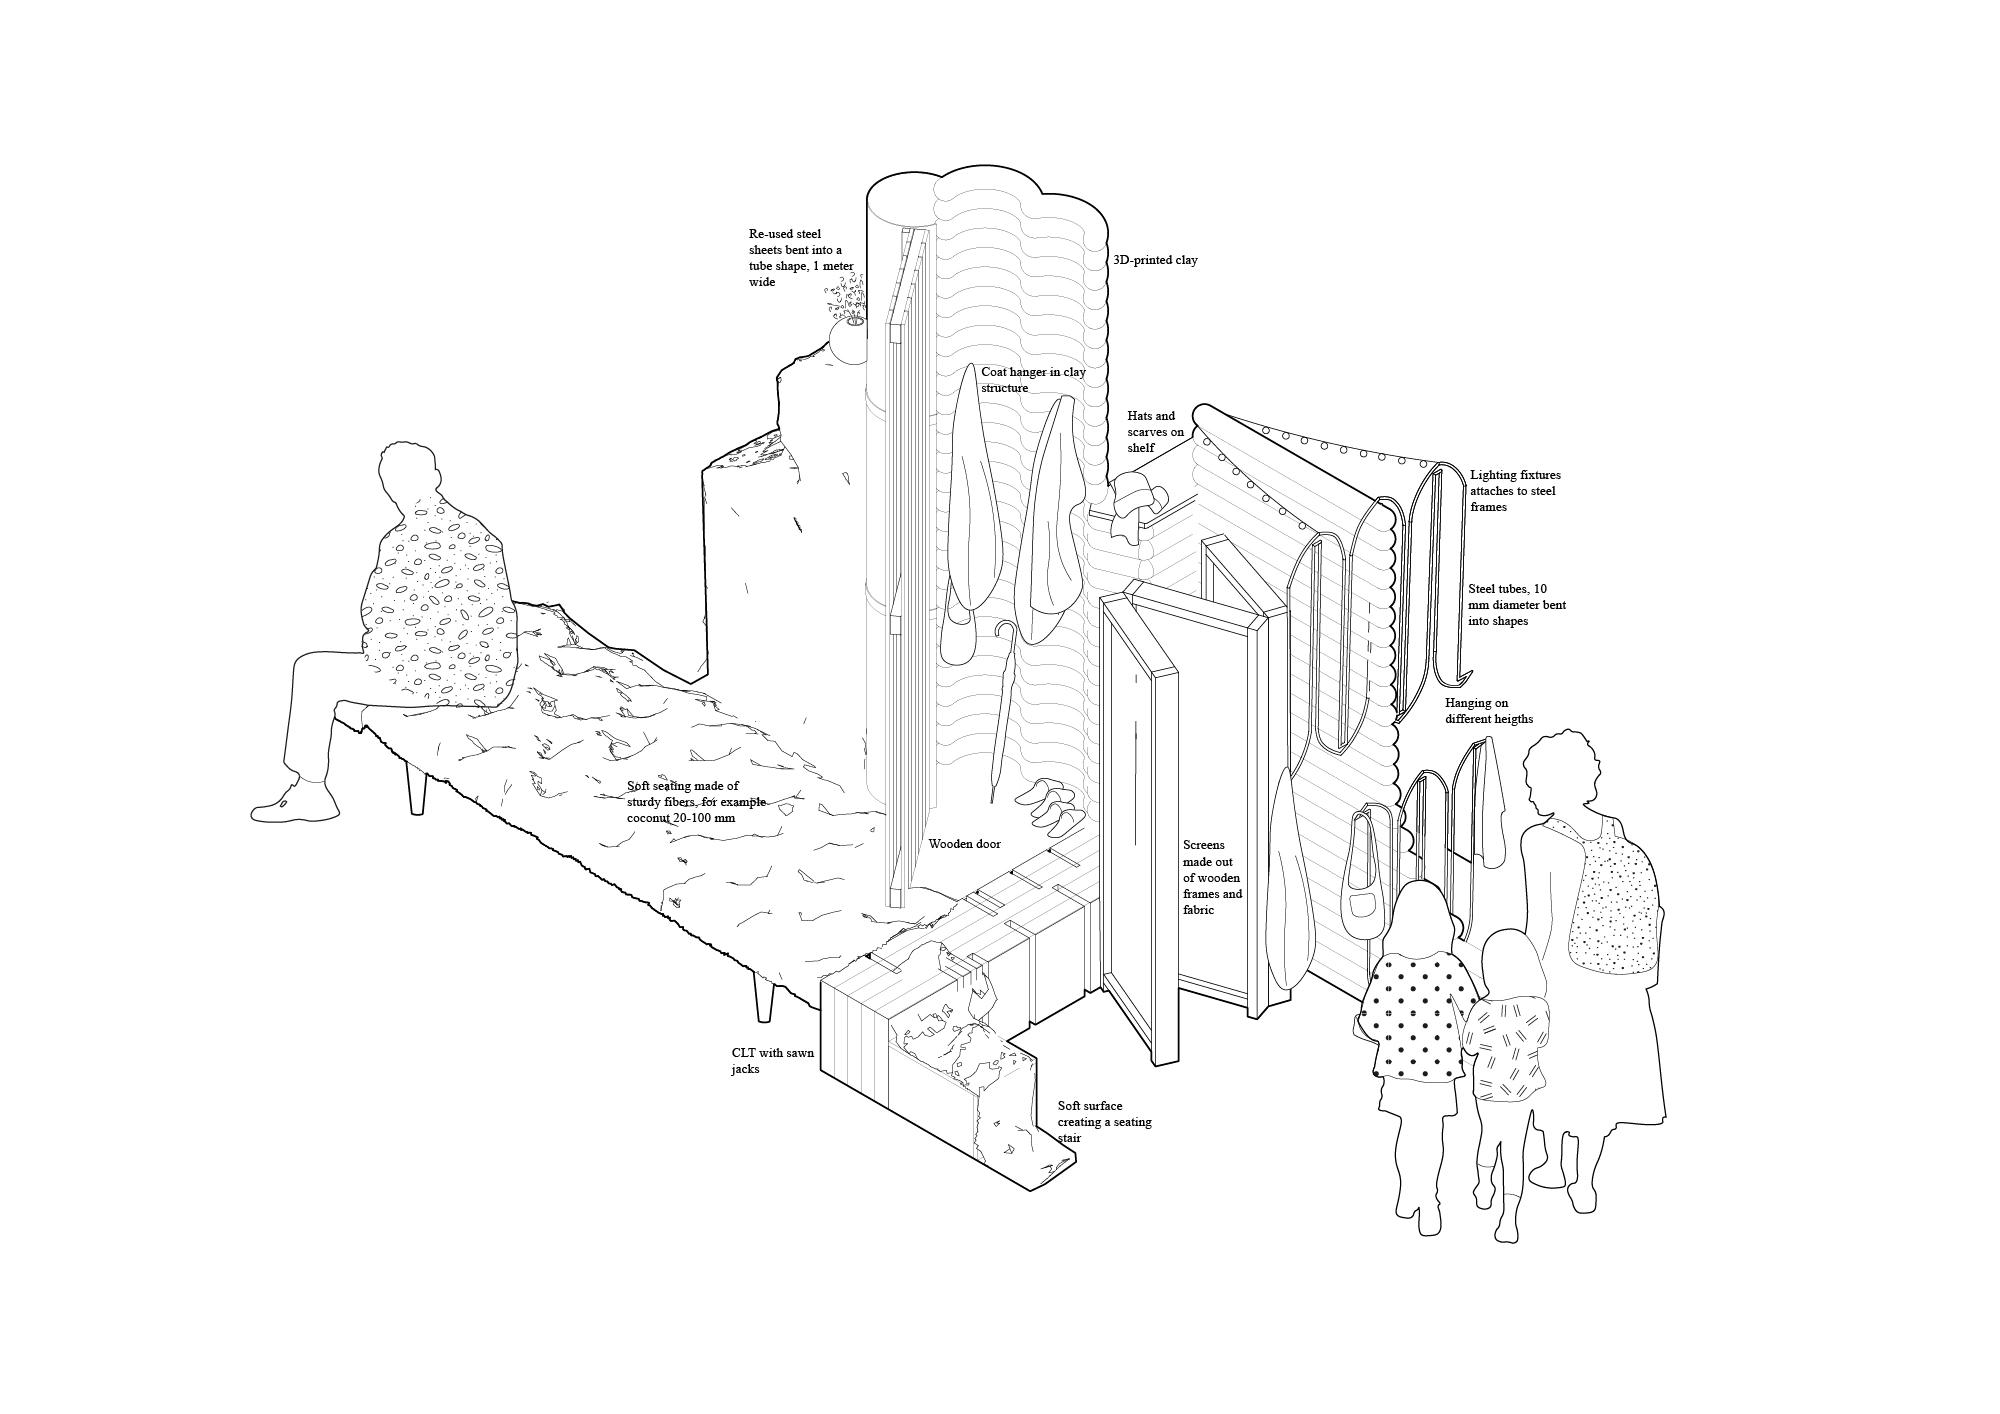 Drawing of cloak room